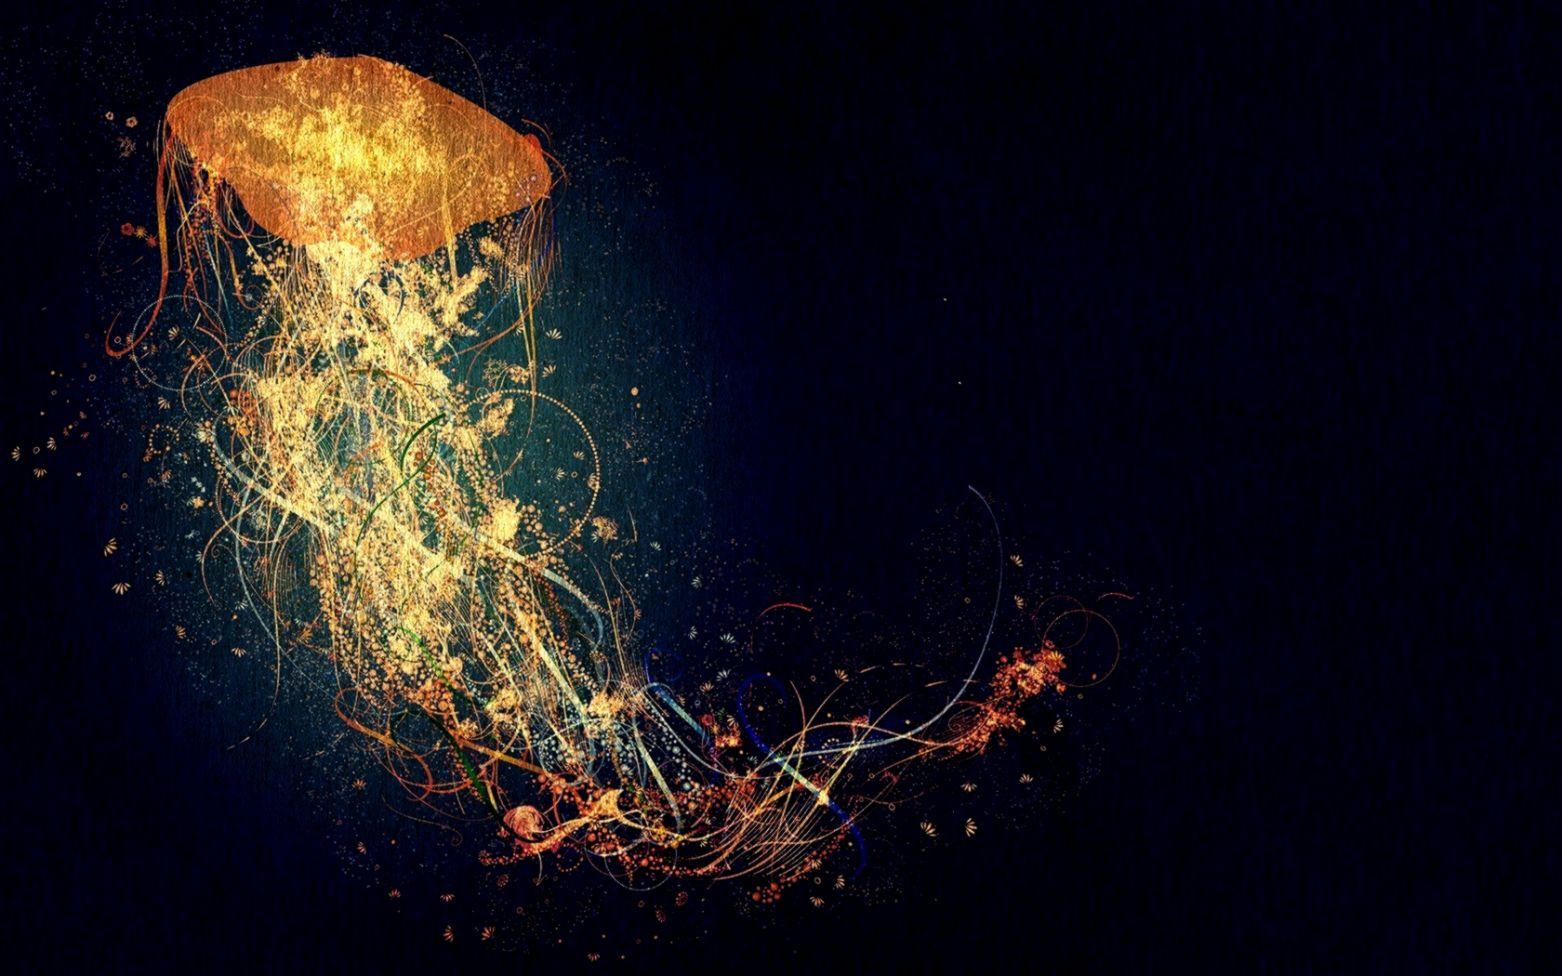 jellyfish hd wallpaper wallpapers